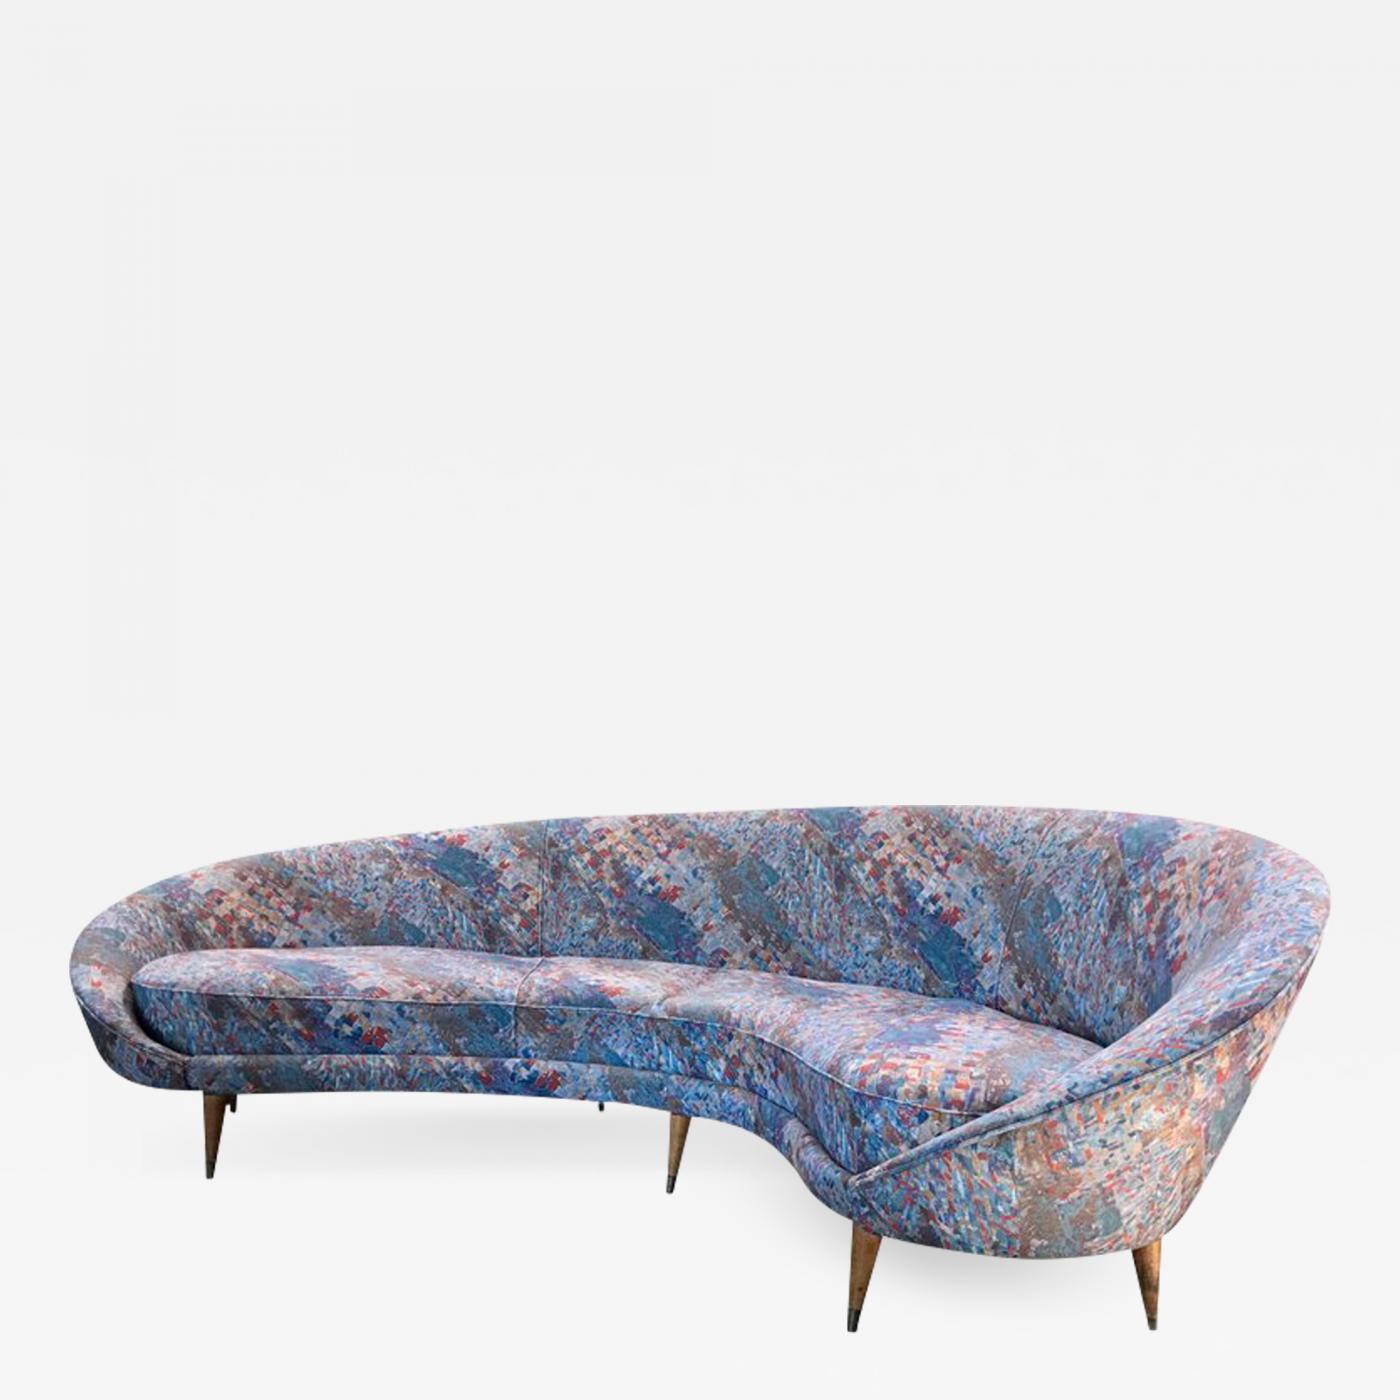 Federico Munari - Federico Munari, 1958 Mid-Century Italian Large Curved  Sofa